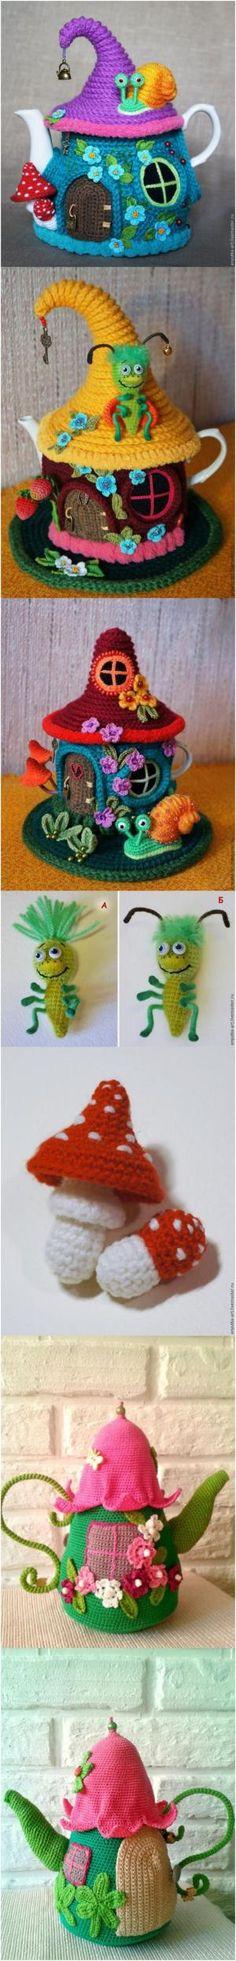 Crochet Tea Kettle Cover with Free Patterns #Crochet #Pattern #Free #Cozy #Tea by simone